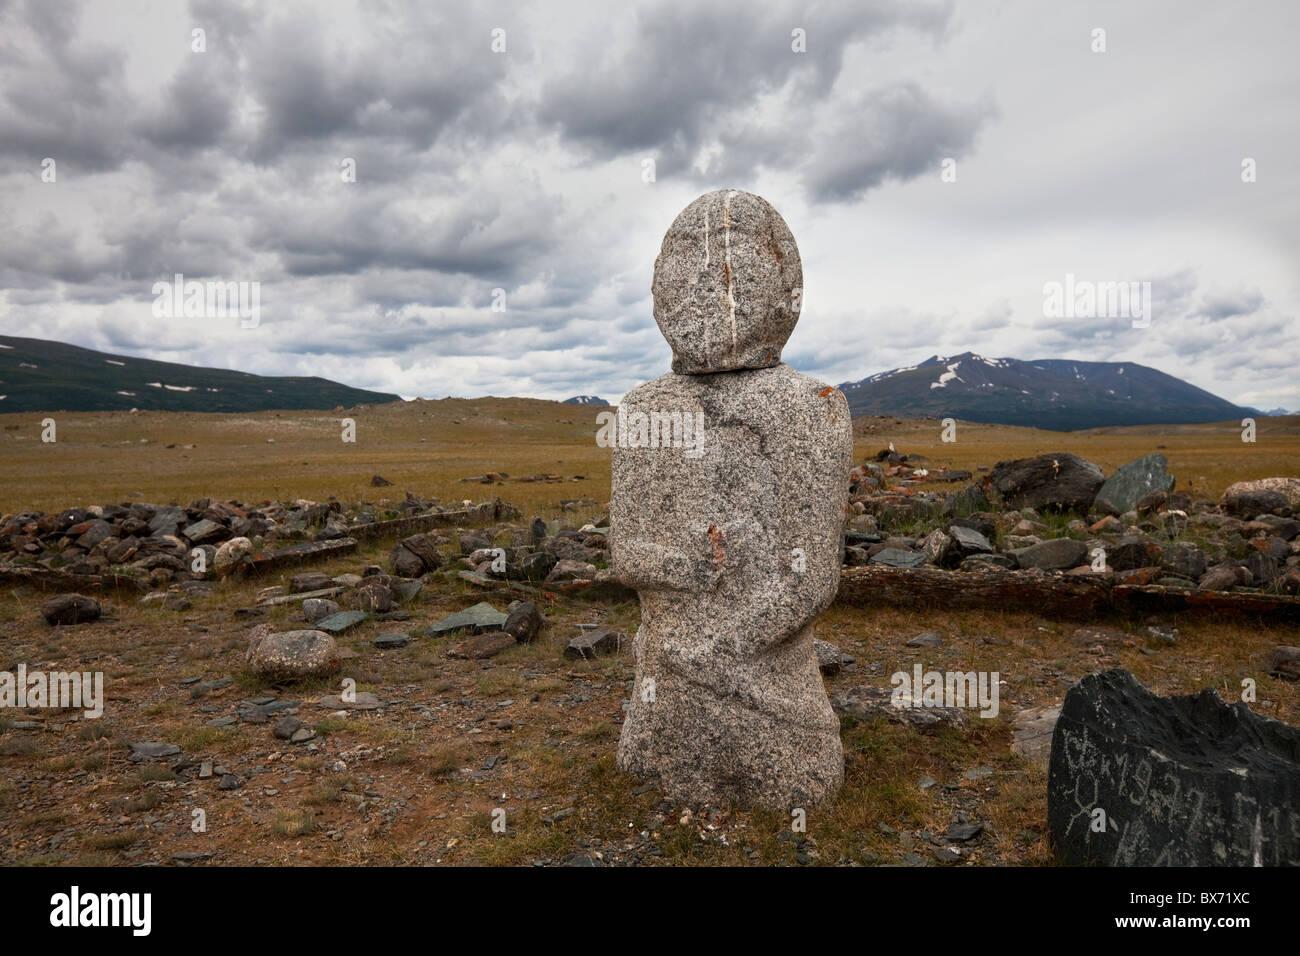 Ancient  stone stele  in Mongolia near lake Hoton, Western  Mongolia - Stock Image